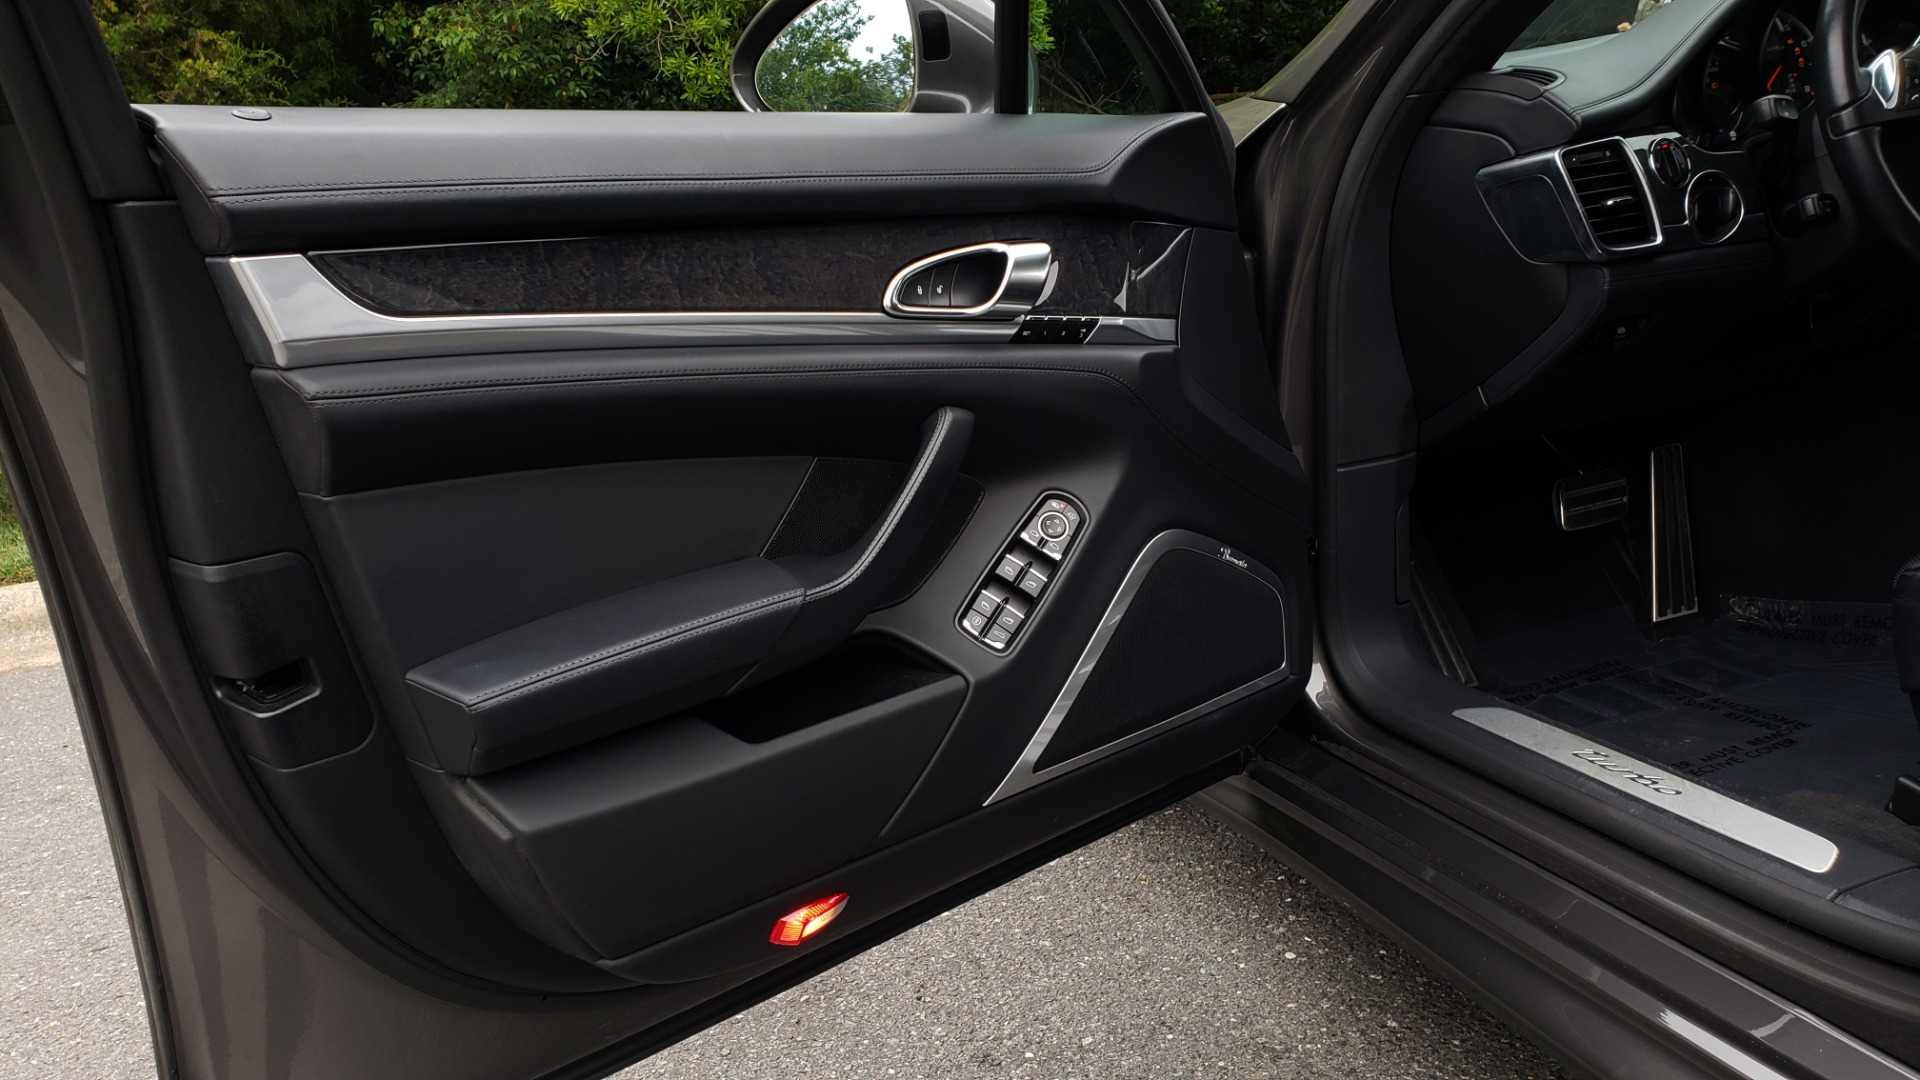 Used 2013 Porsche PANAMERA TURBO 4.8L V8 / AWD / NAV / SUNROOF / LCA / PARK ASST / BURMESTER for sale $45,995 at Formula Imports in Charlotte NC 28227 29